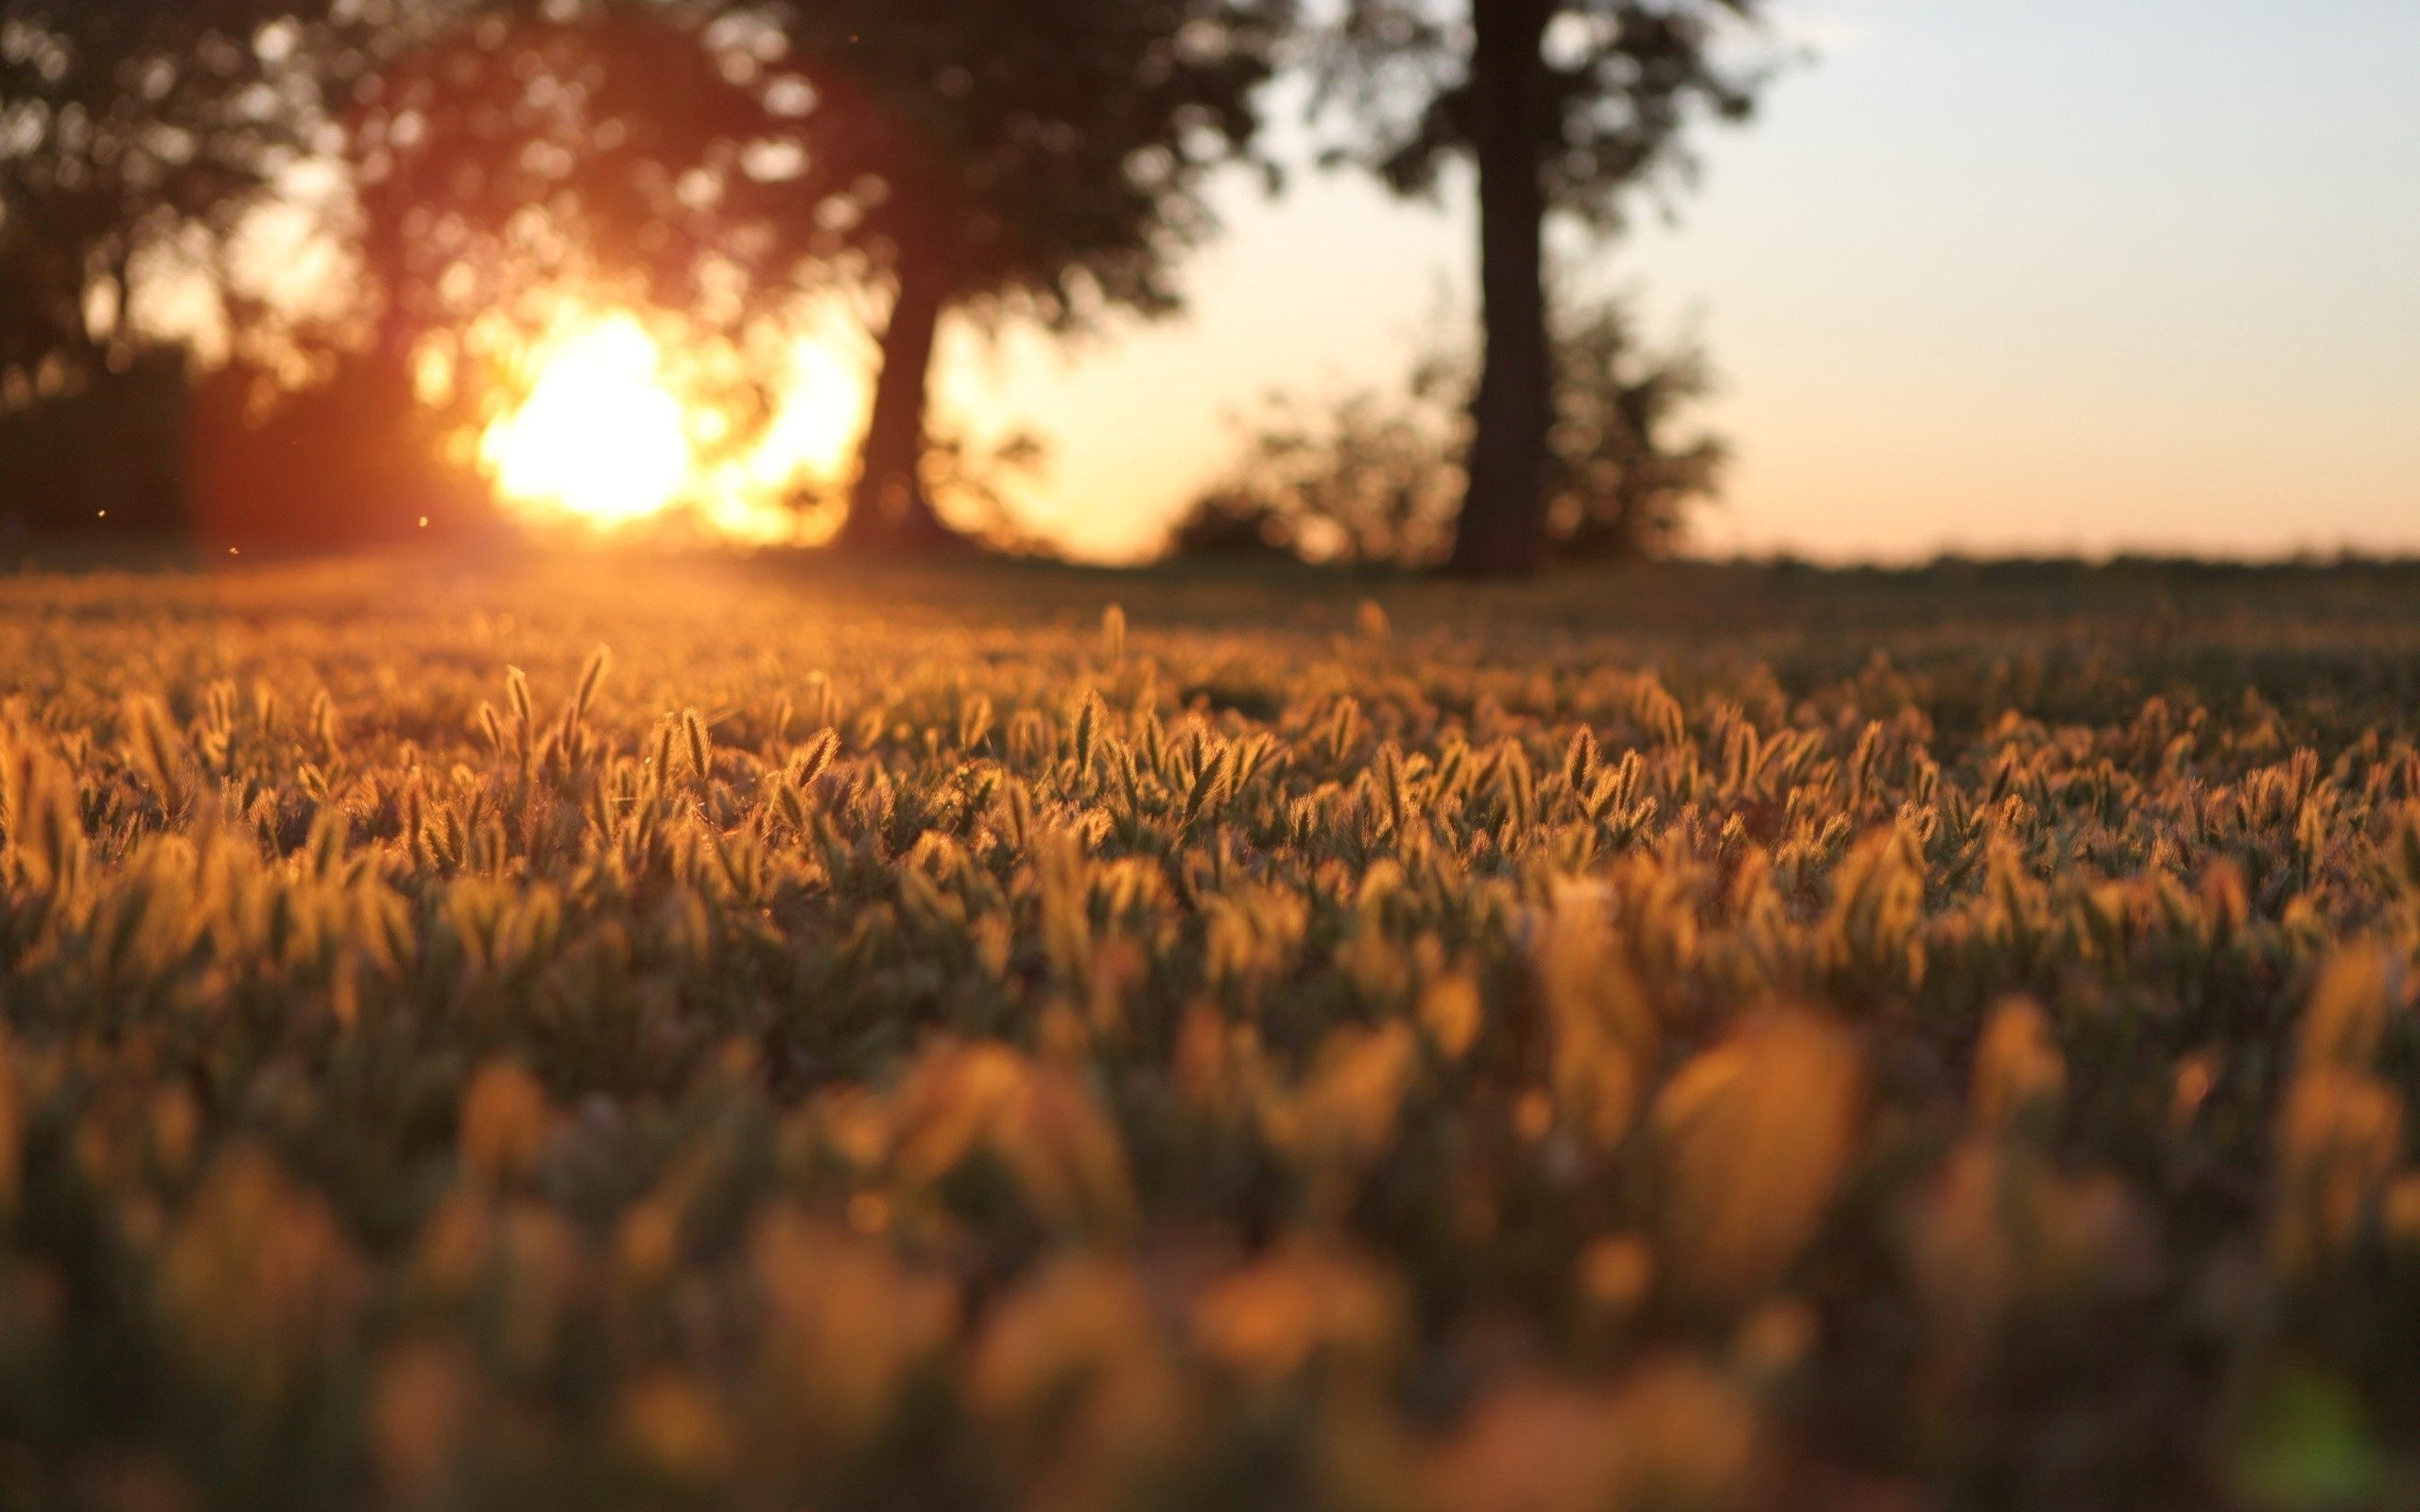 sunset over grain field wallpaper - Grain Wallpaper